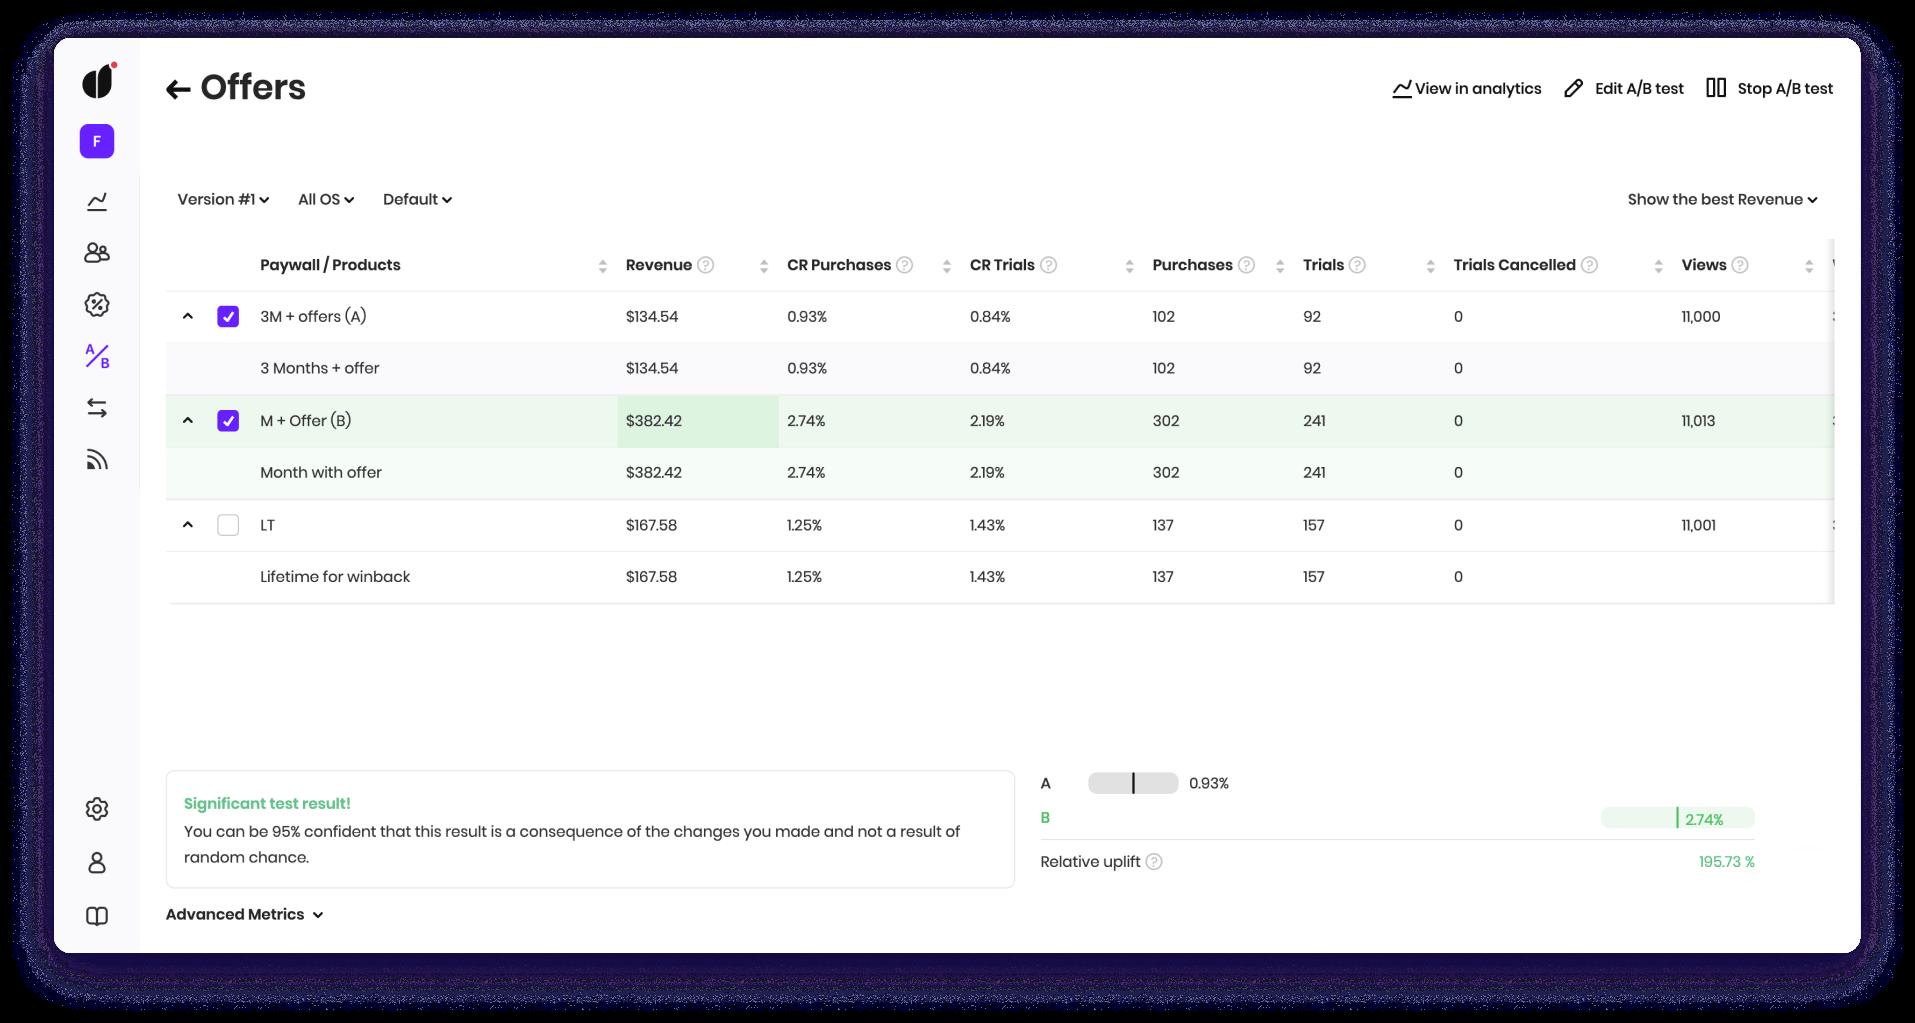 A/B test metrics page